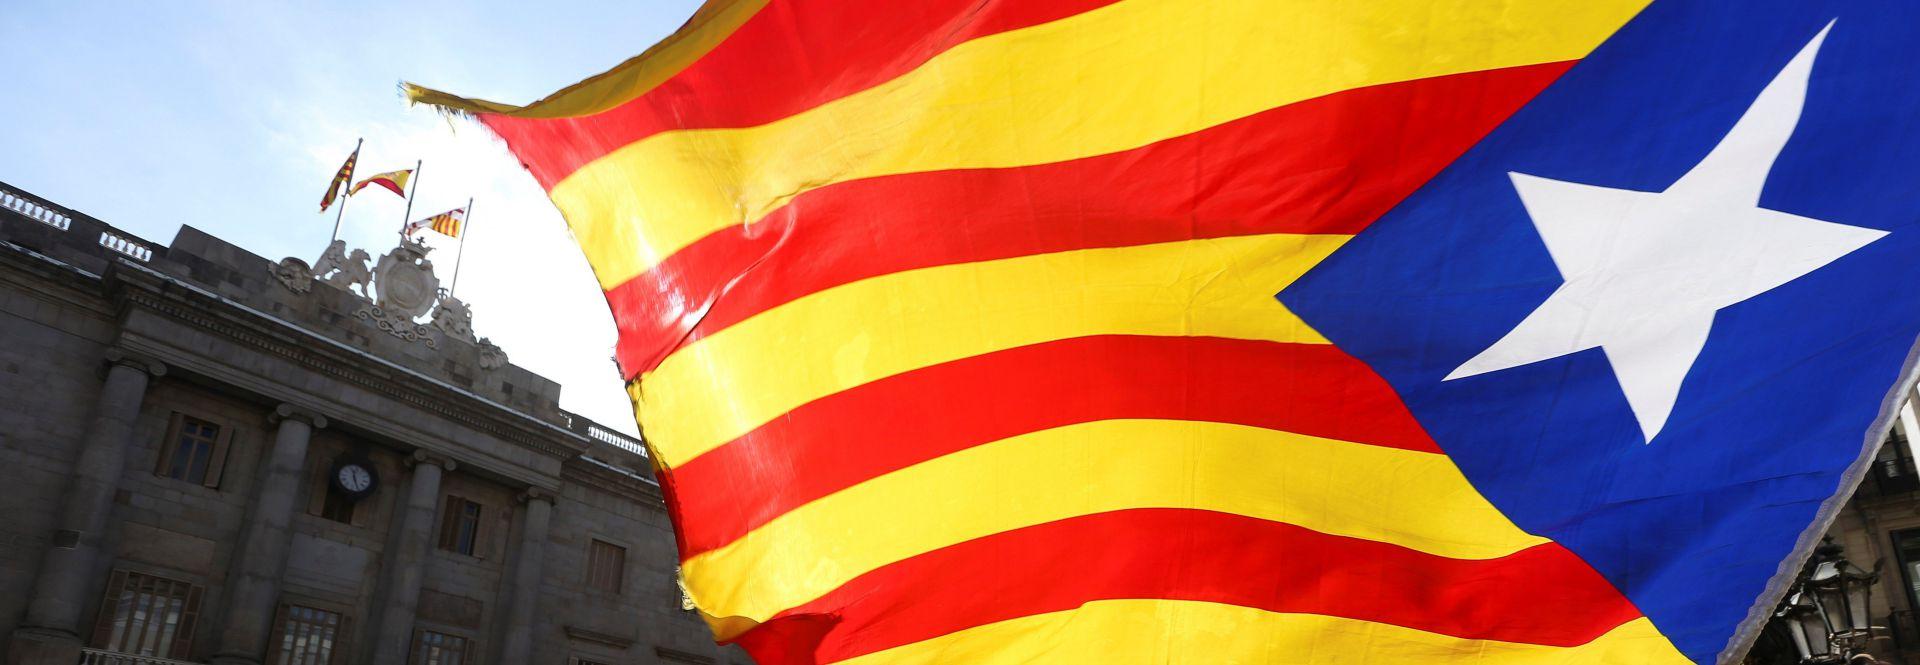 Catalonia, capital Brussels?